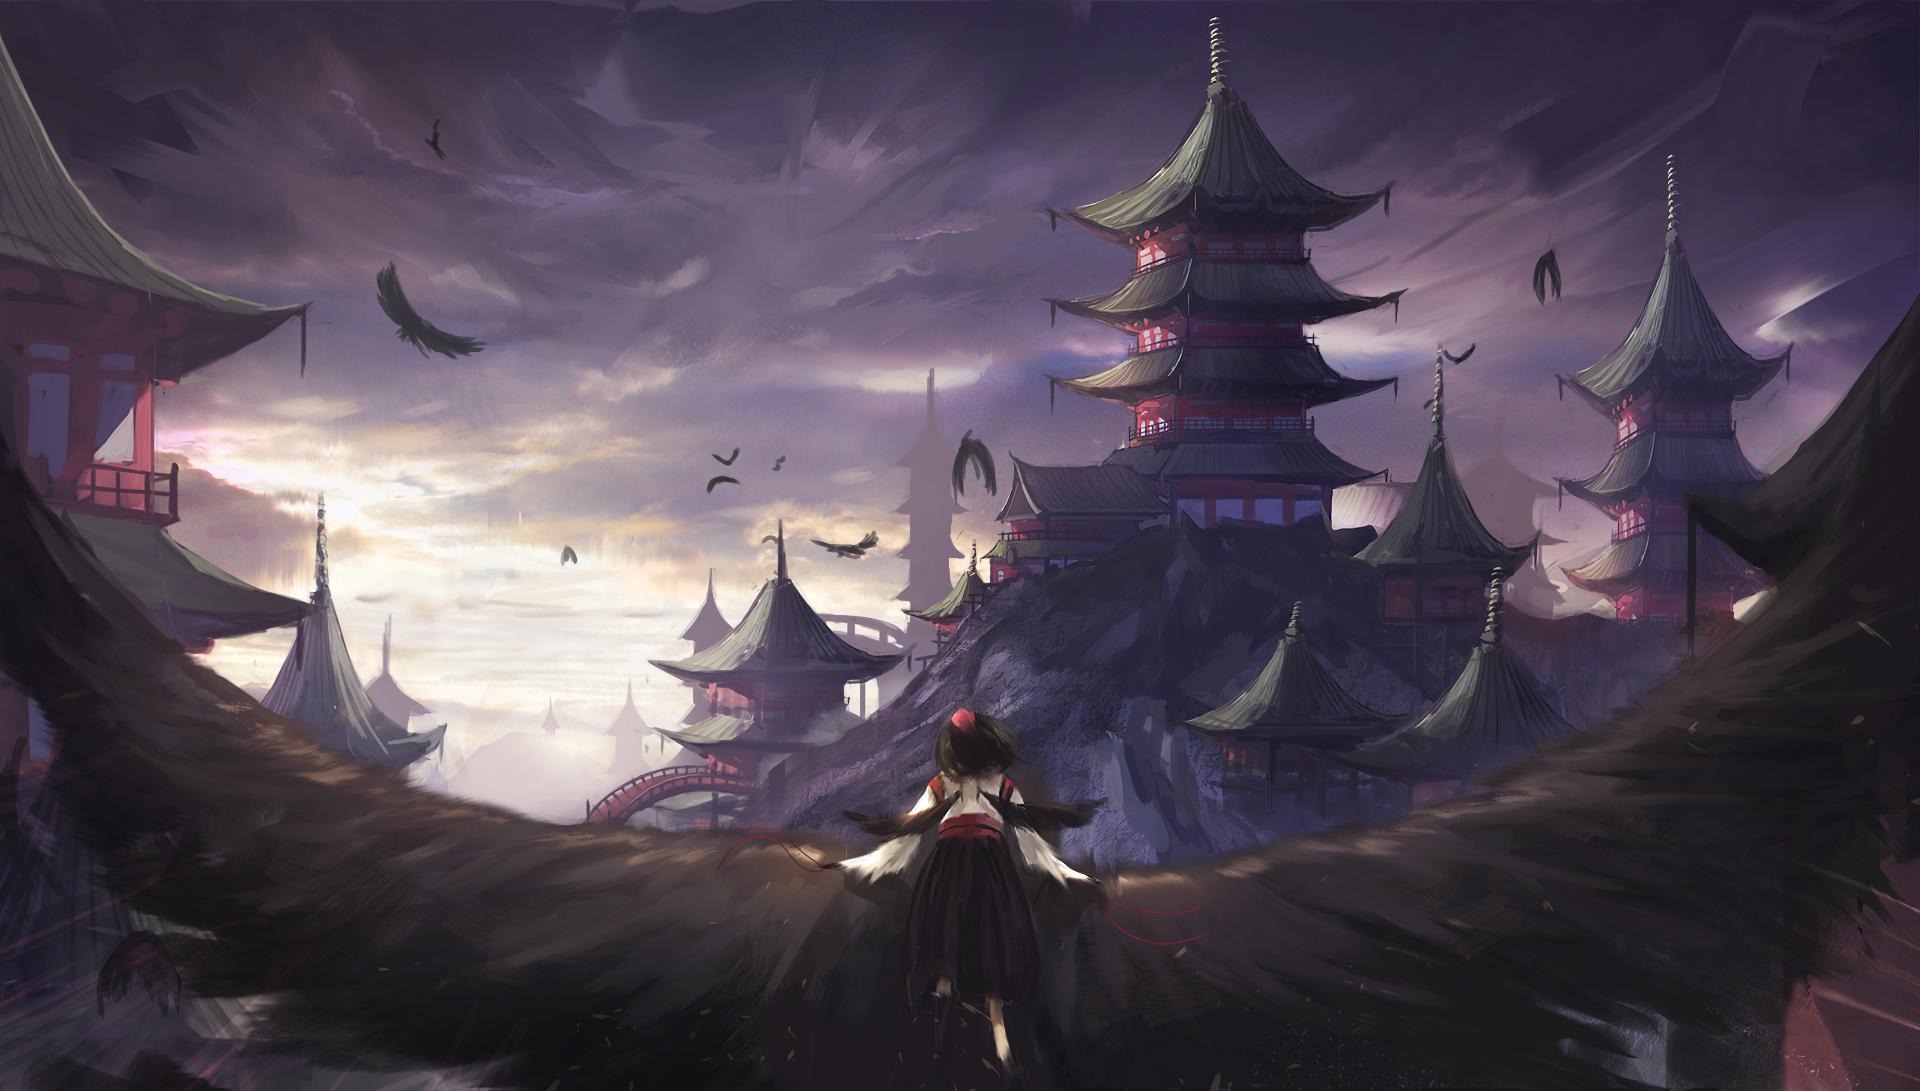 Anime - Touhou  Aya Shameimaru Duvarkağıdı